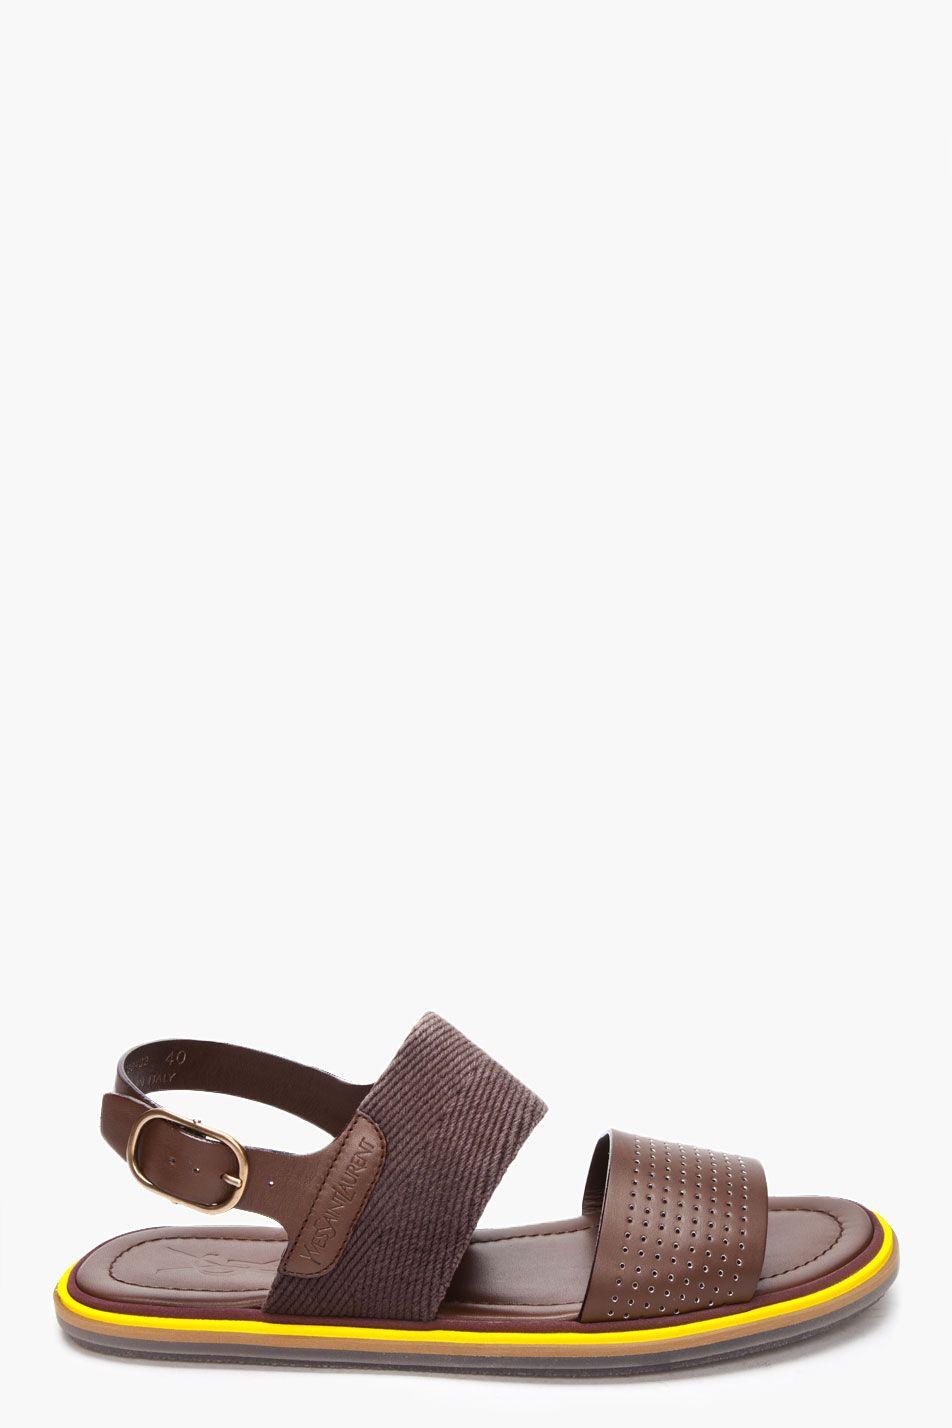 SandalsFlat Perforated Laurent Yves Saint Leather 8Pwn0Ok